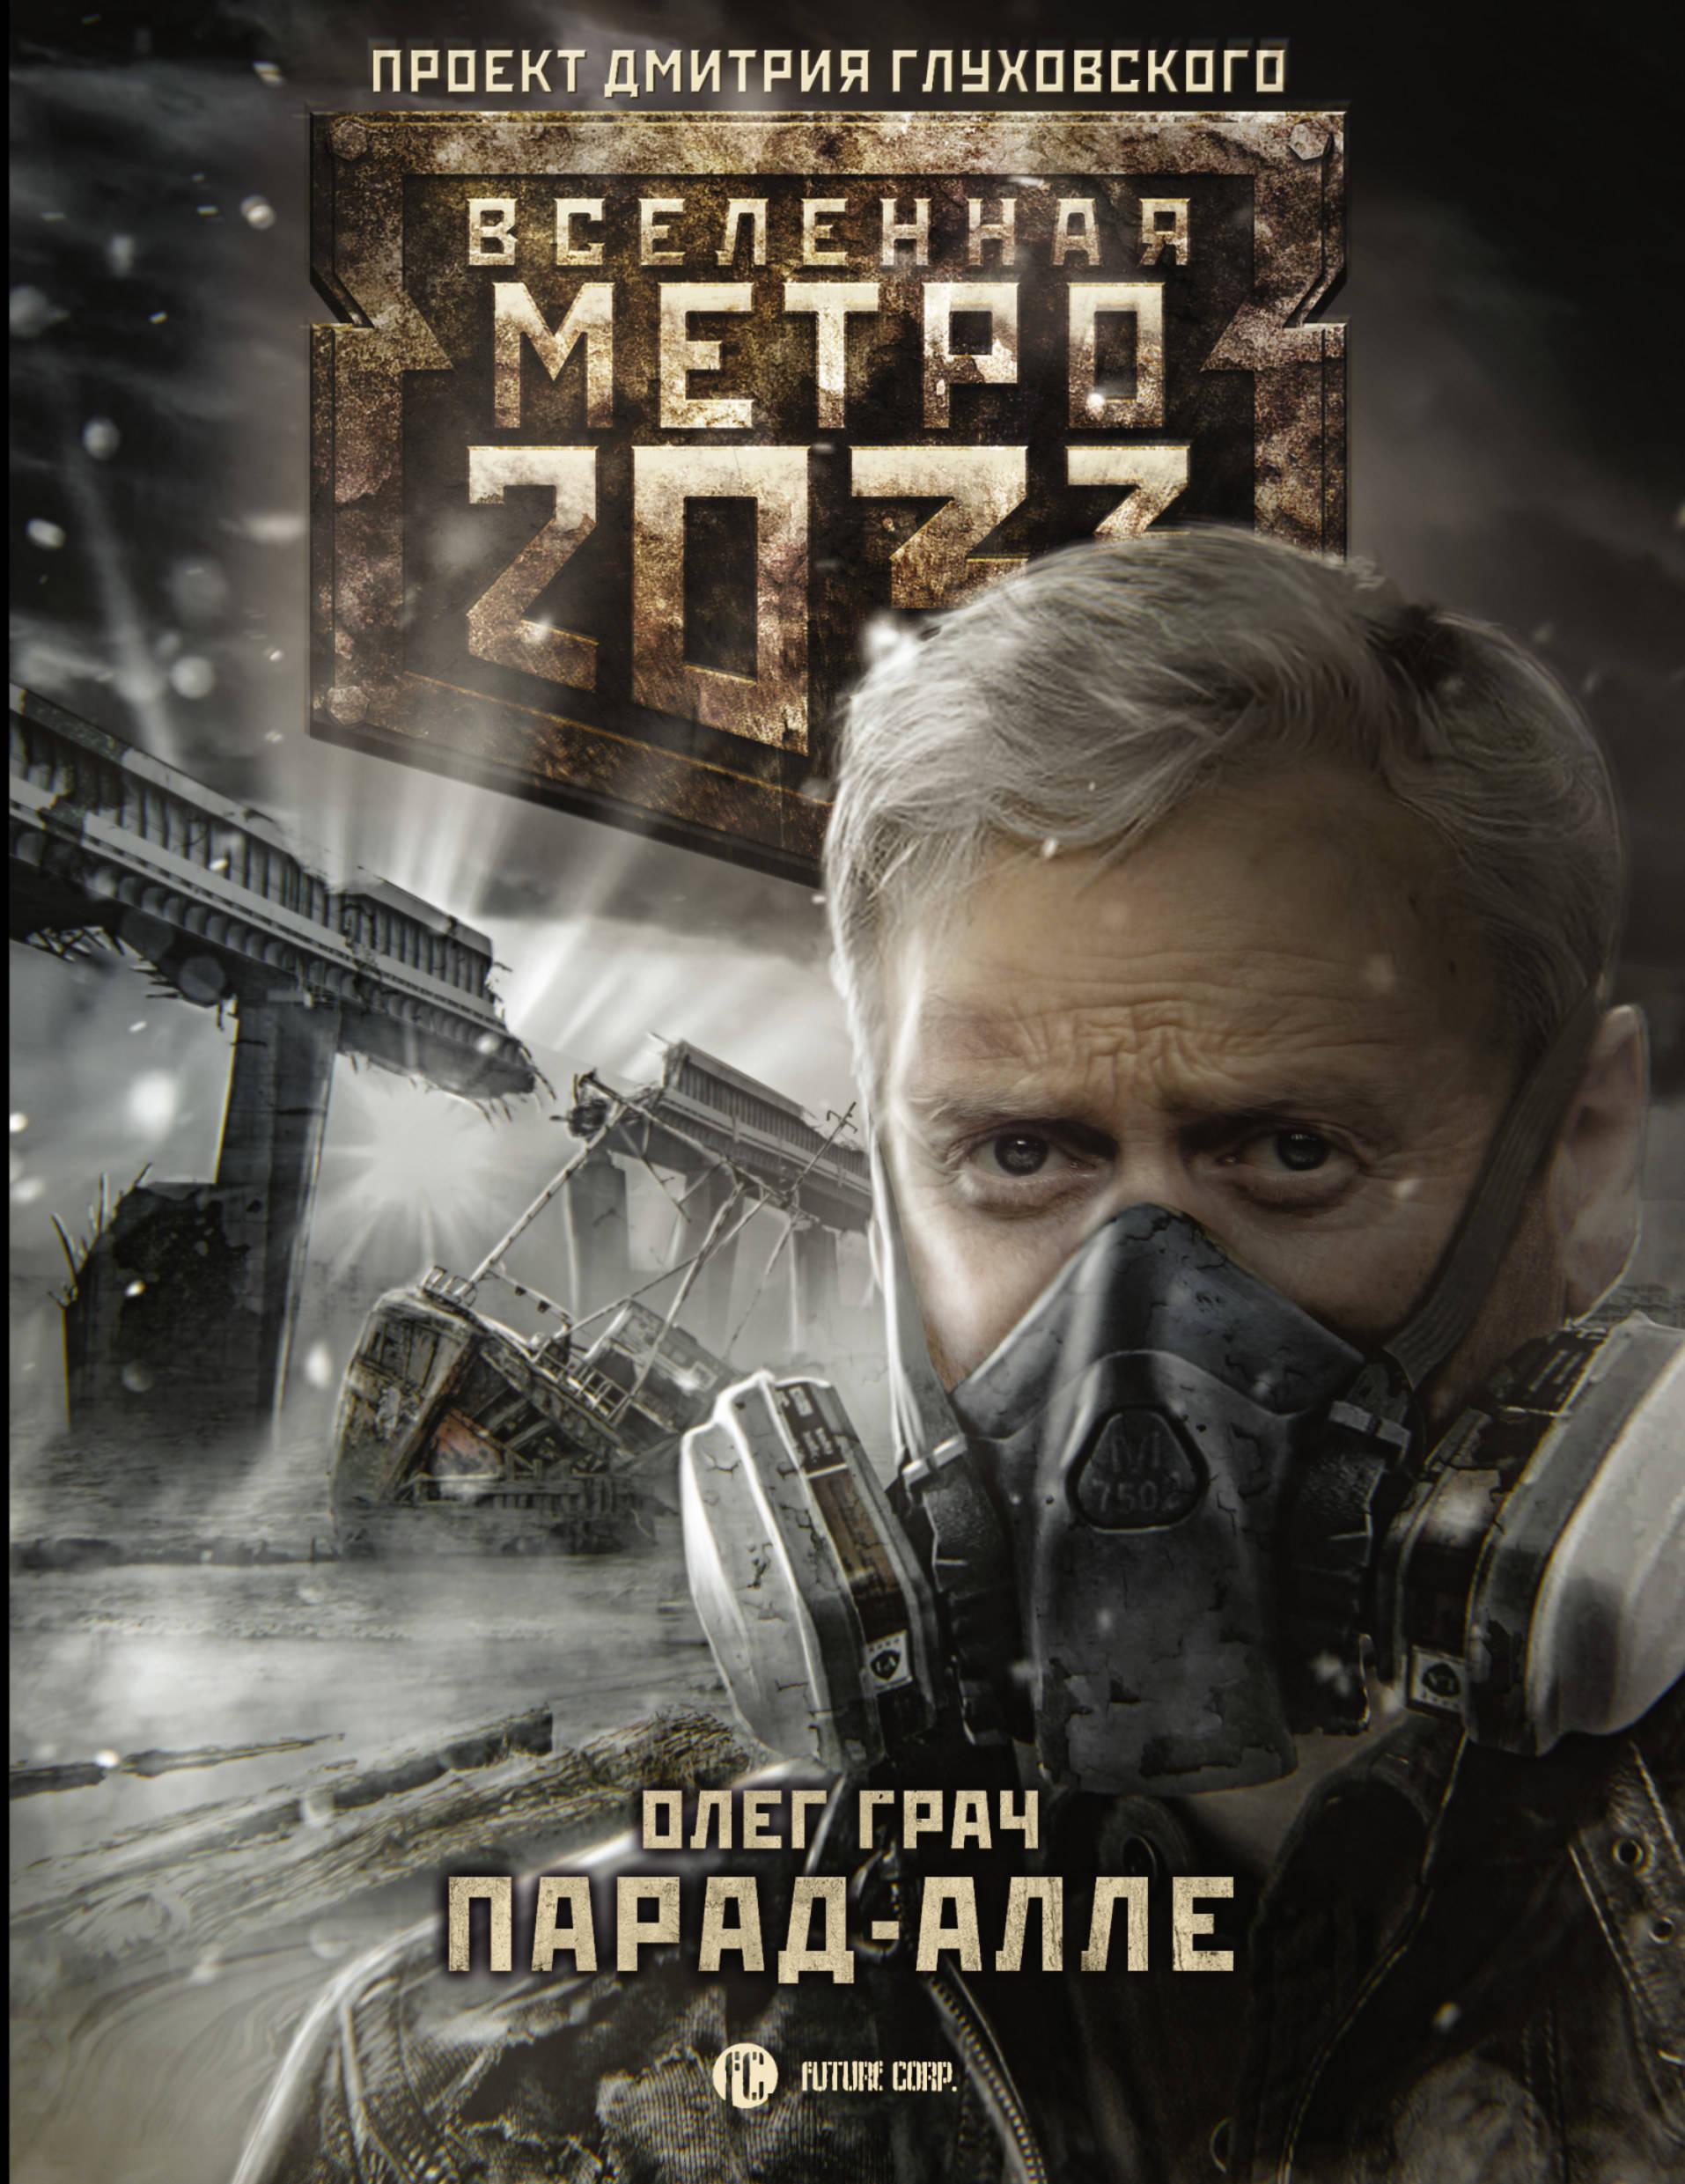 Метро 2033: Парад-алле. Олег Грач